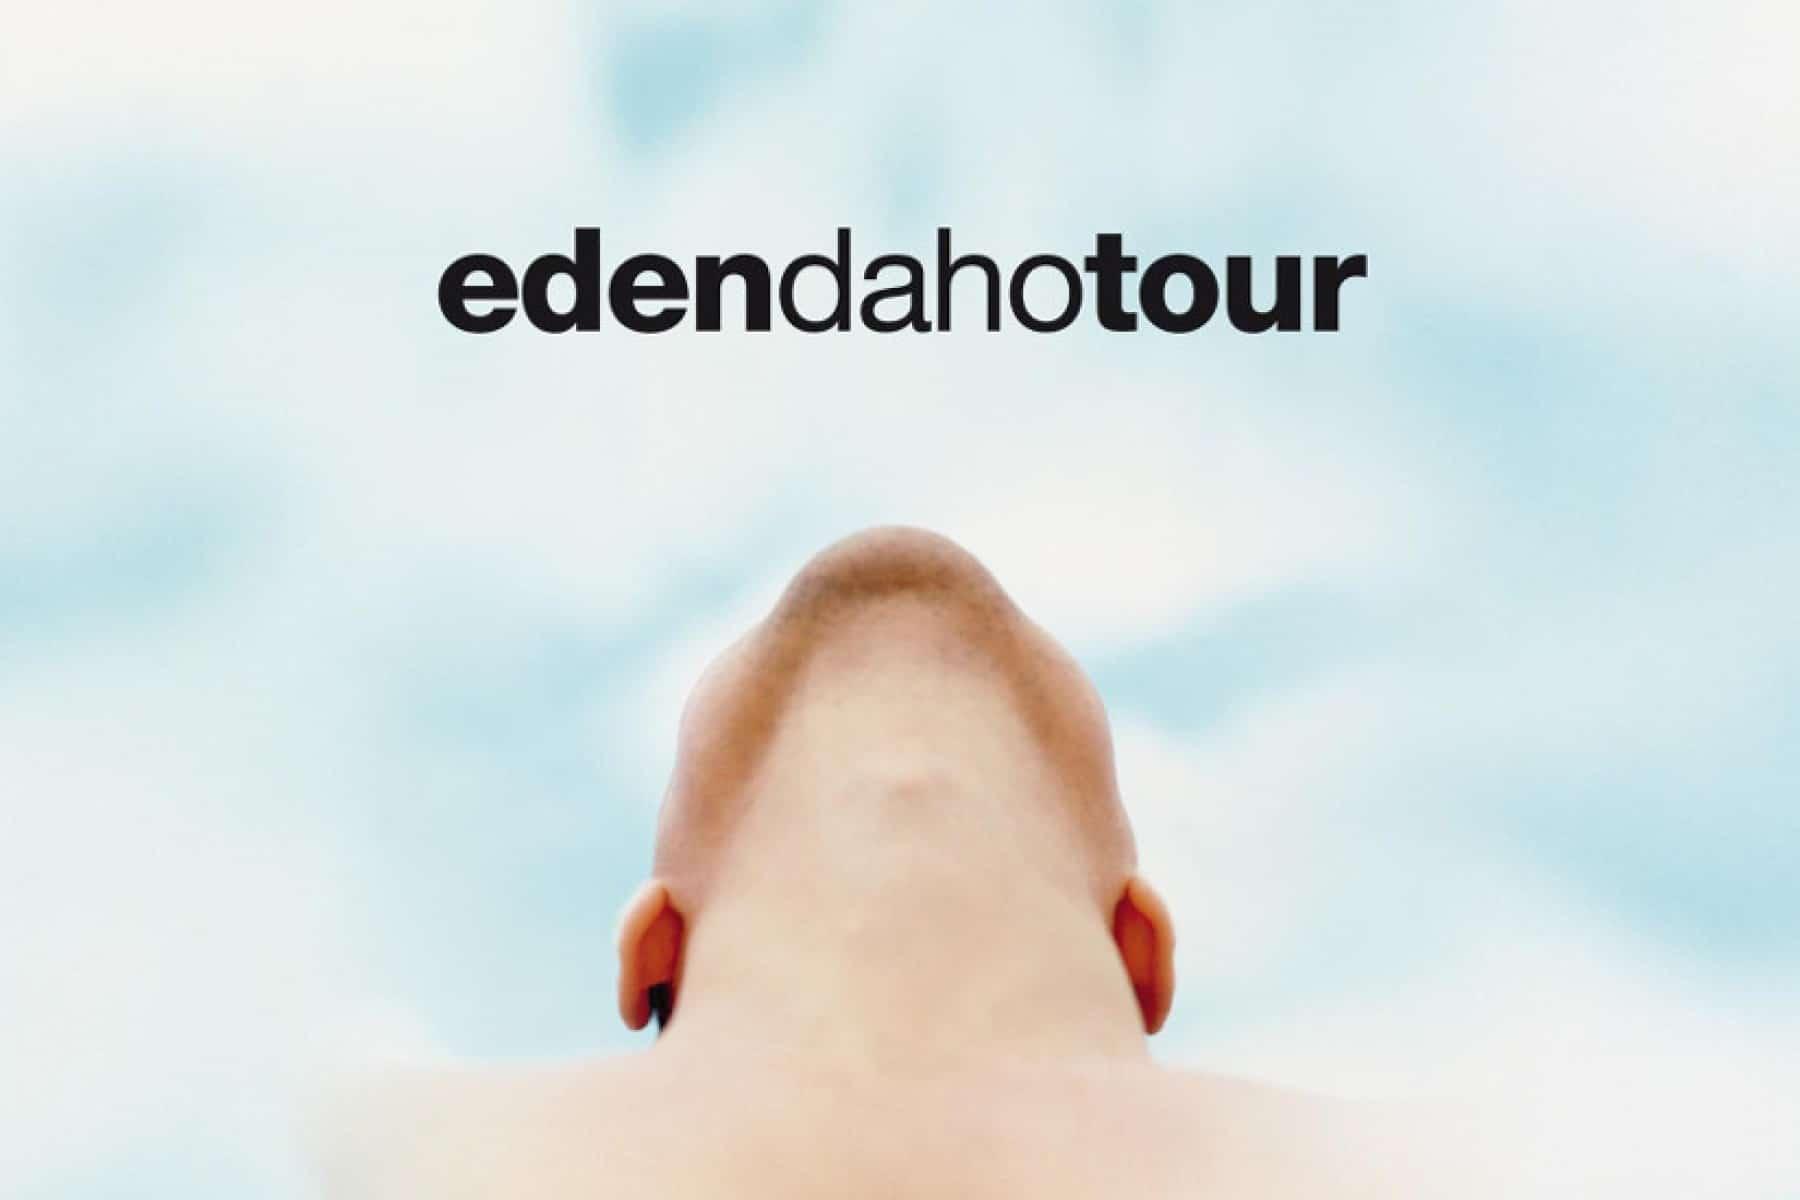 EdendahoTour-Affiche-ParisBazaar-Borde